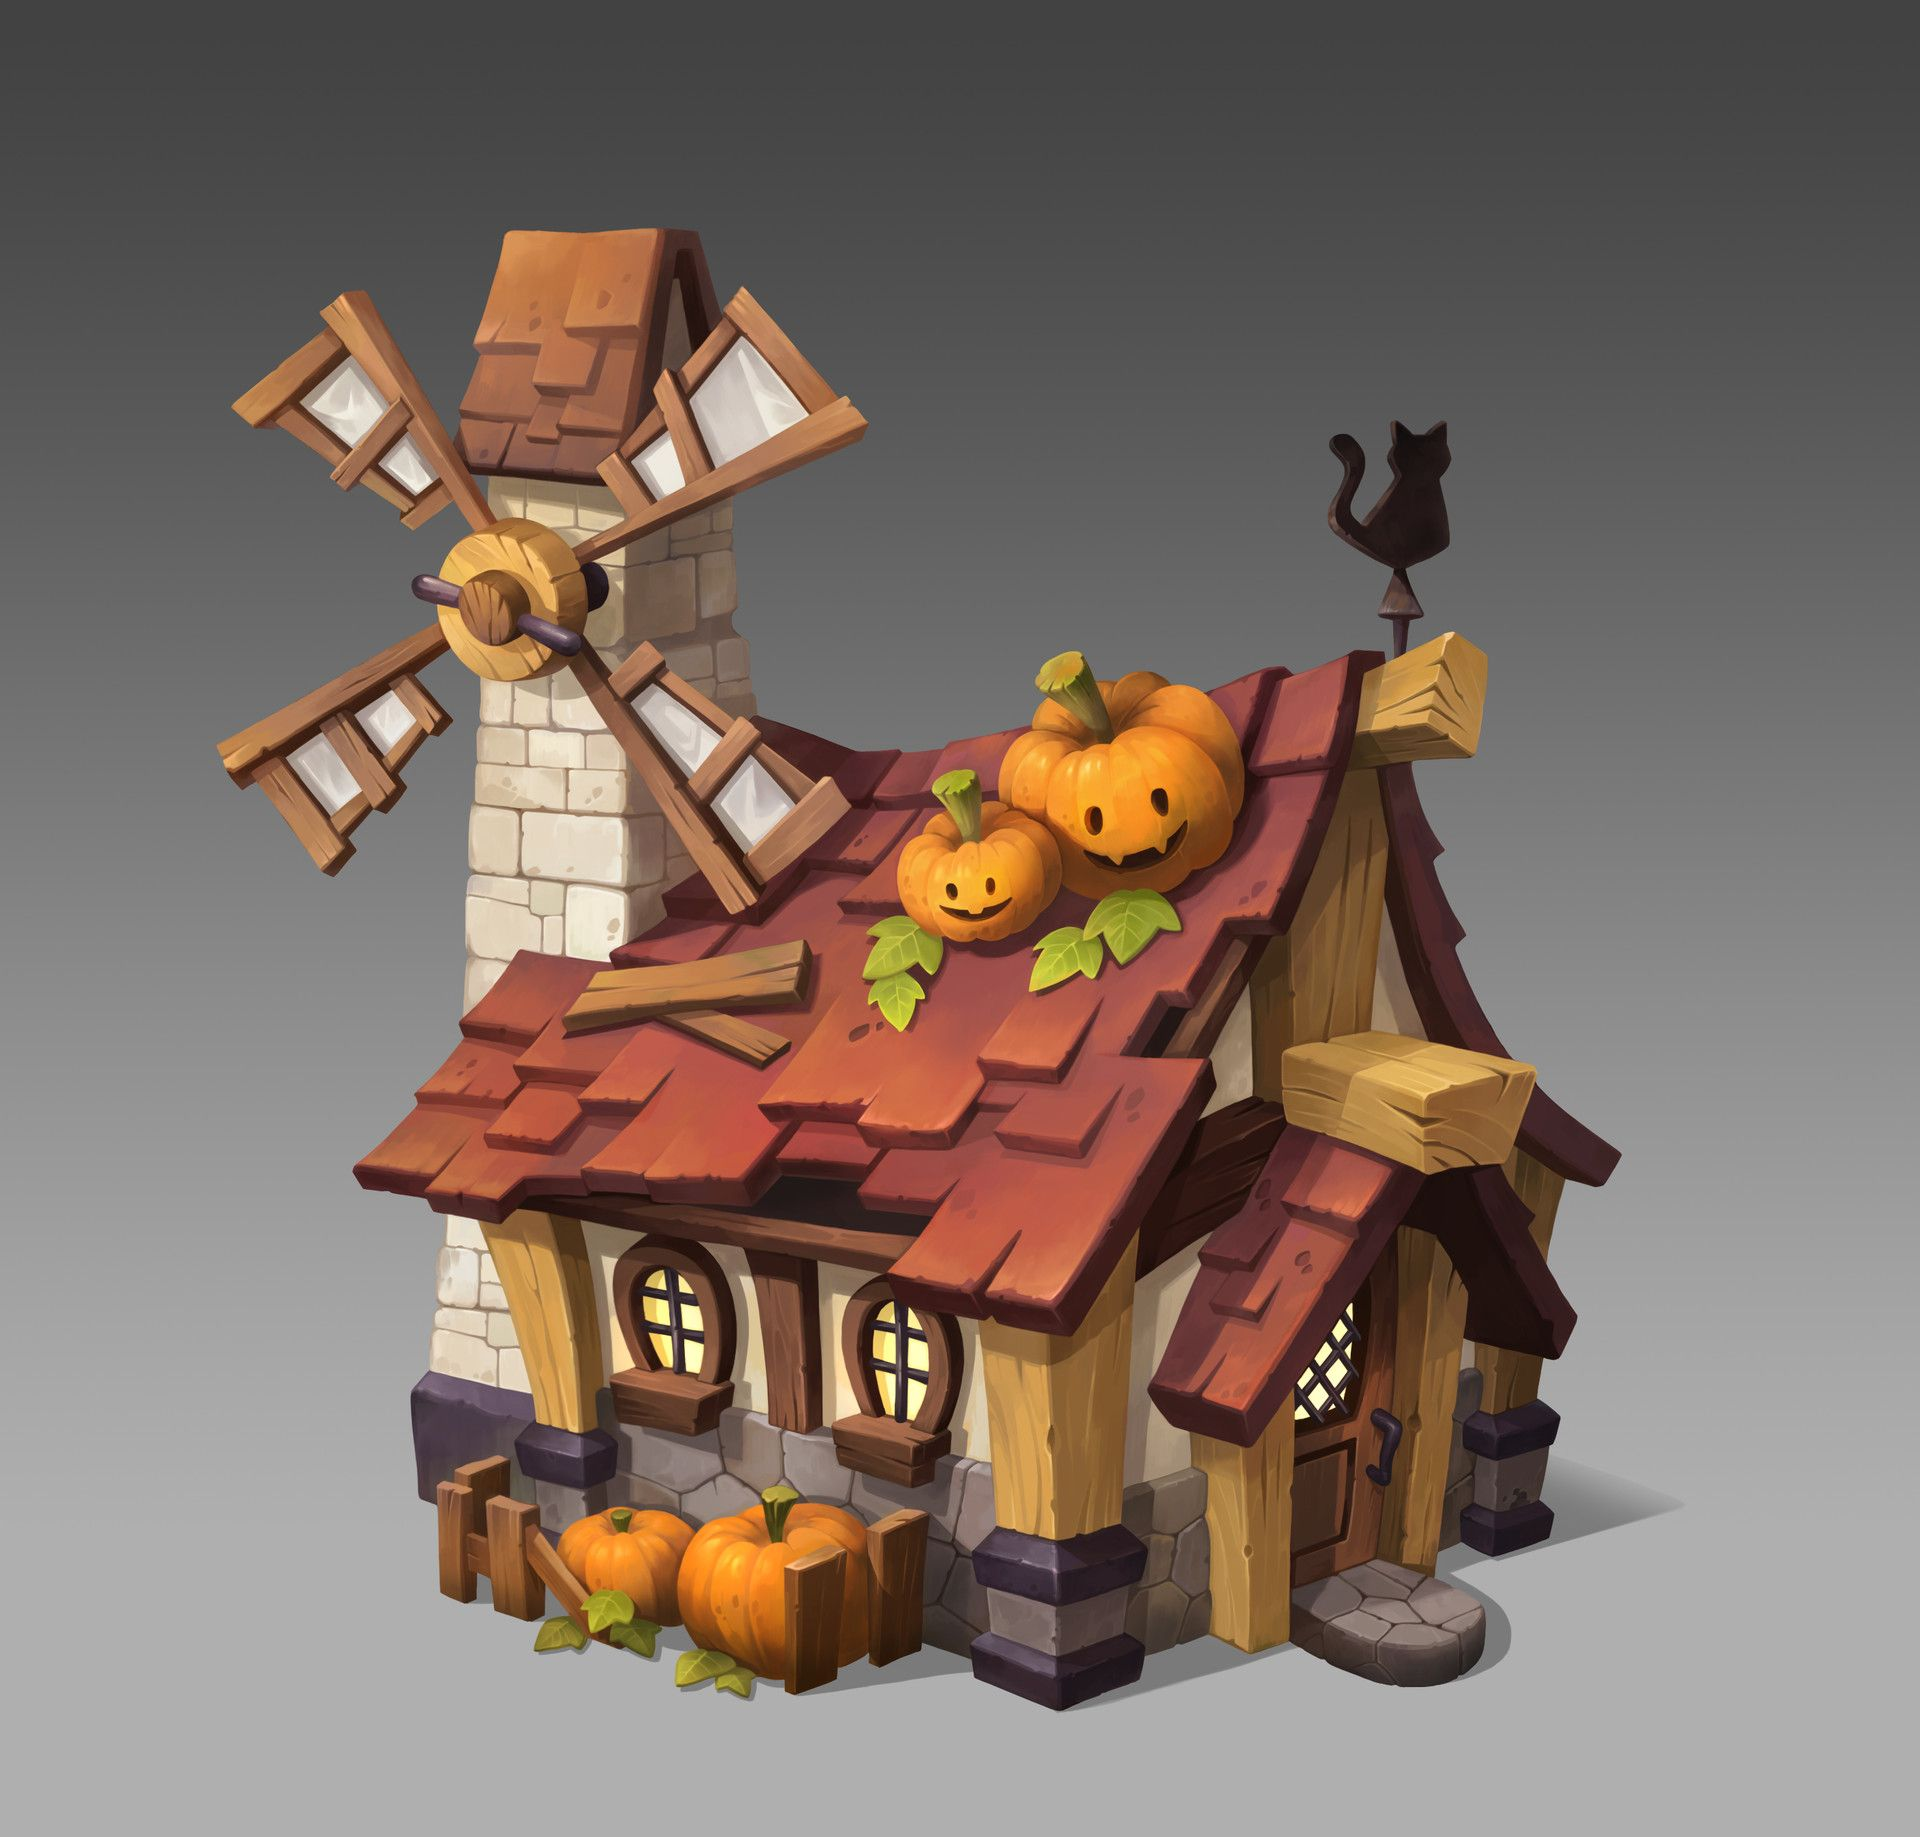 ArtStation Pumpkin, Farmer's house, del goni Game